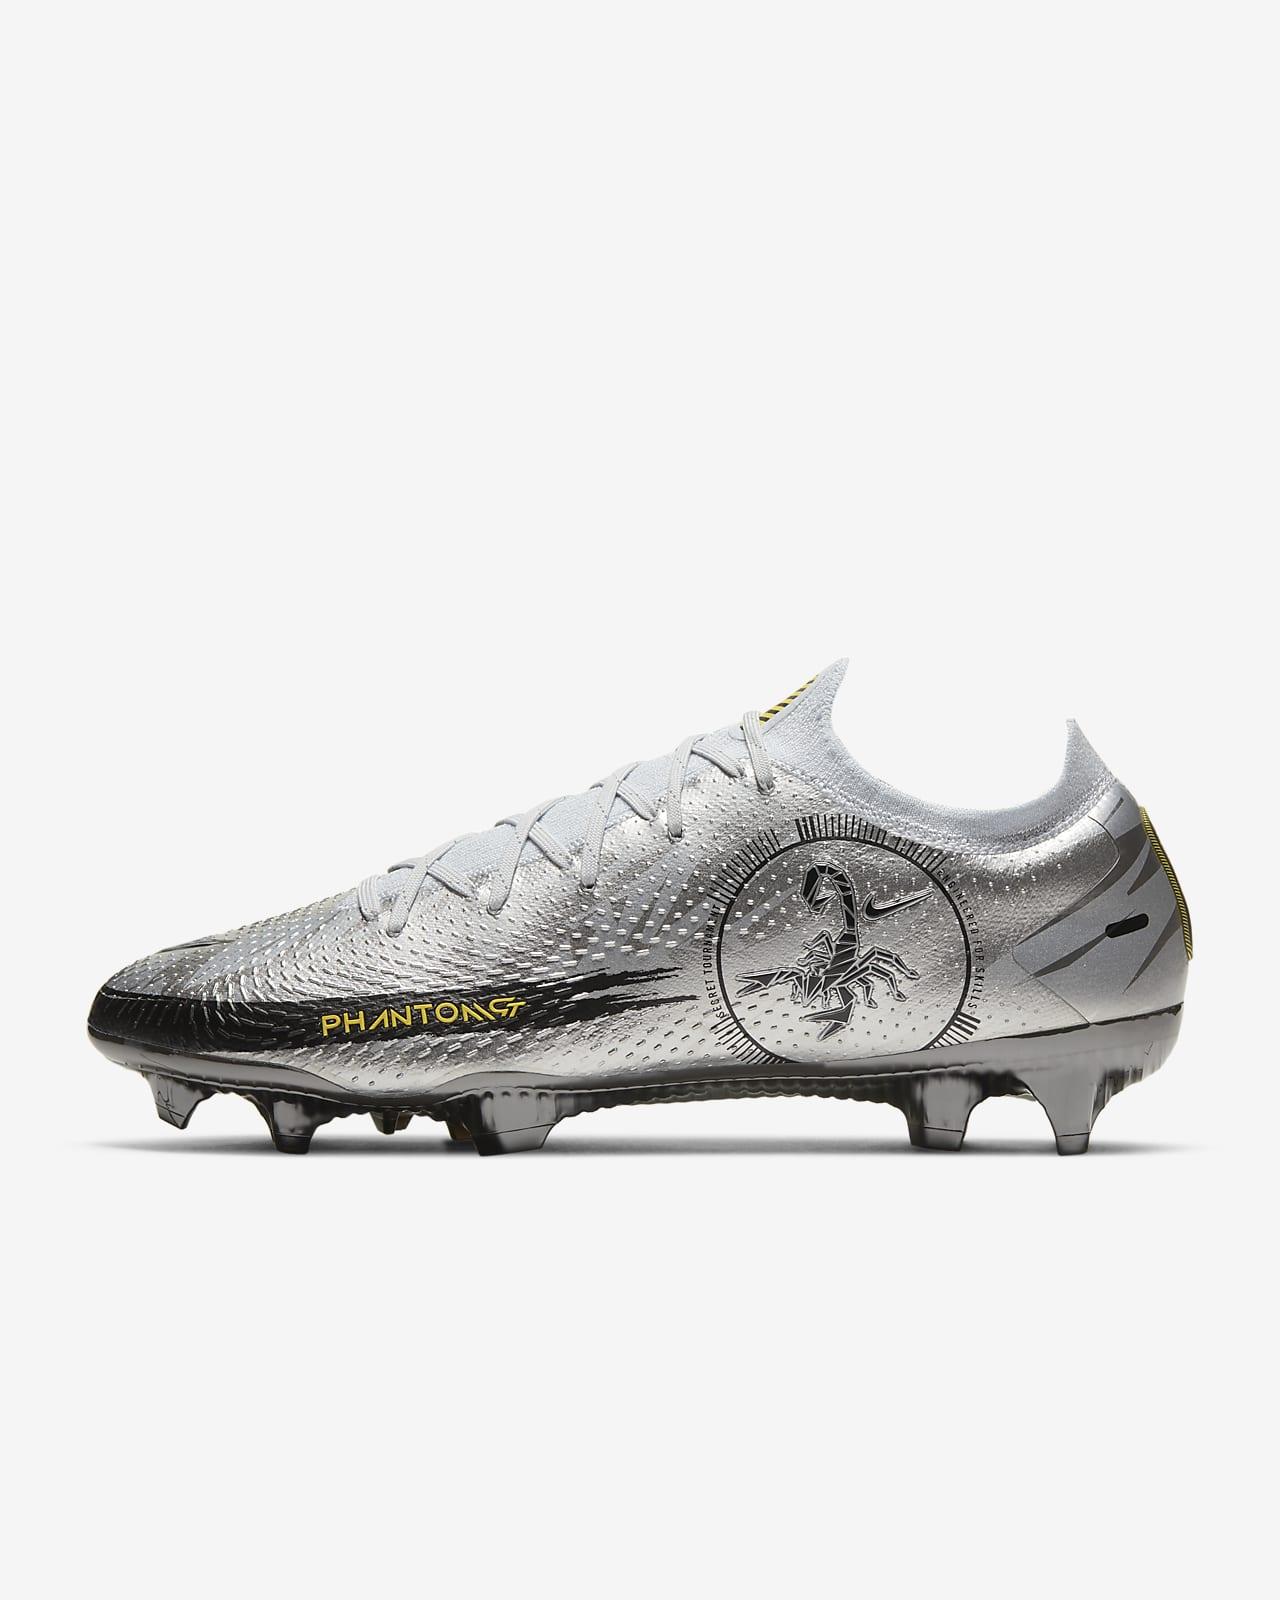 Chaussure de football à crampons pour terrain sec Nike Phantom Scorpion Elite FG